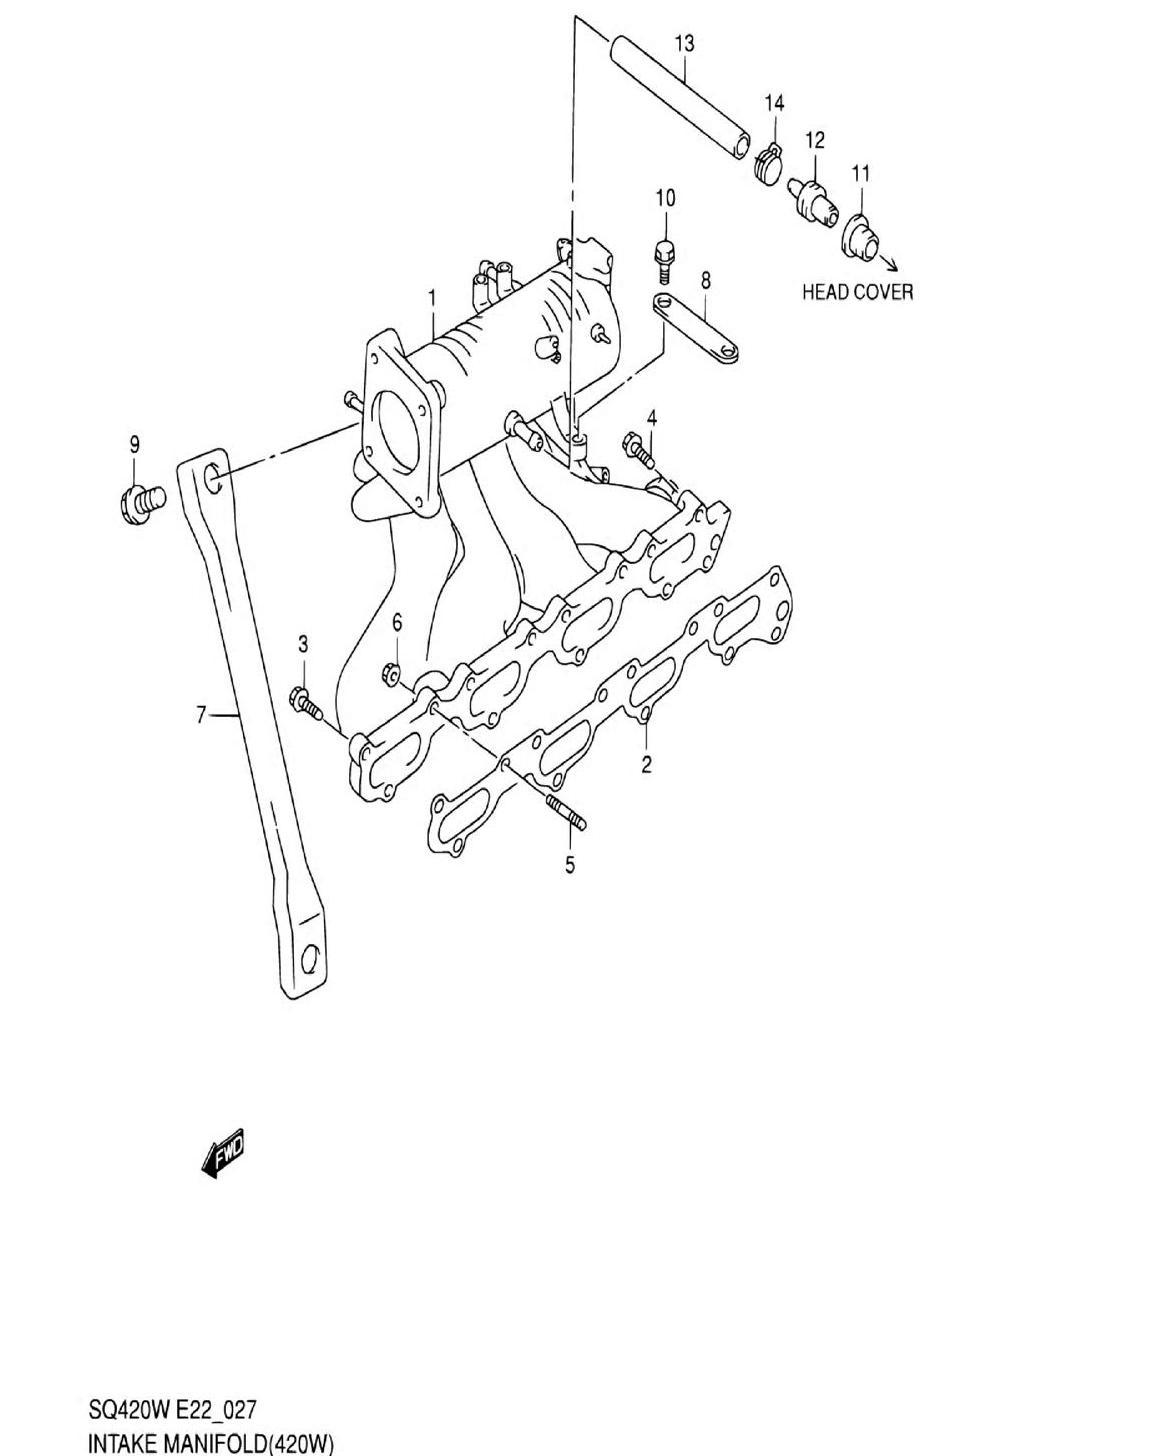 27 - Всасывающий коллектор (SQ420W)